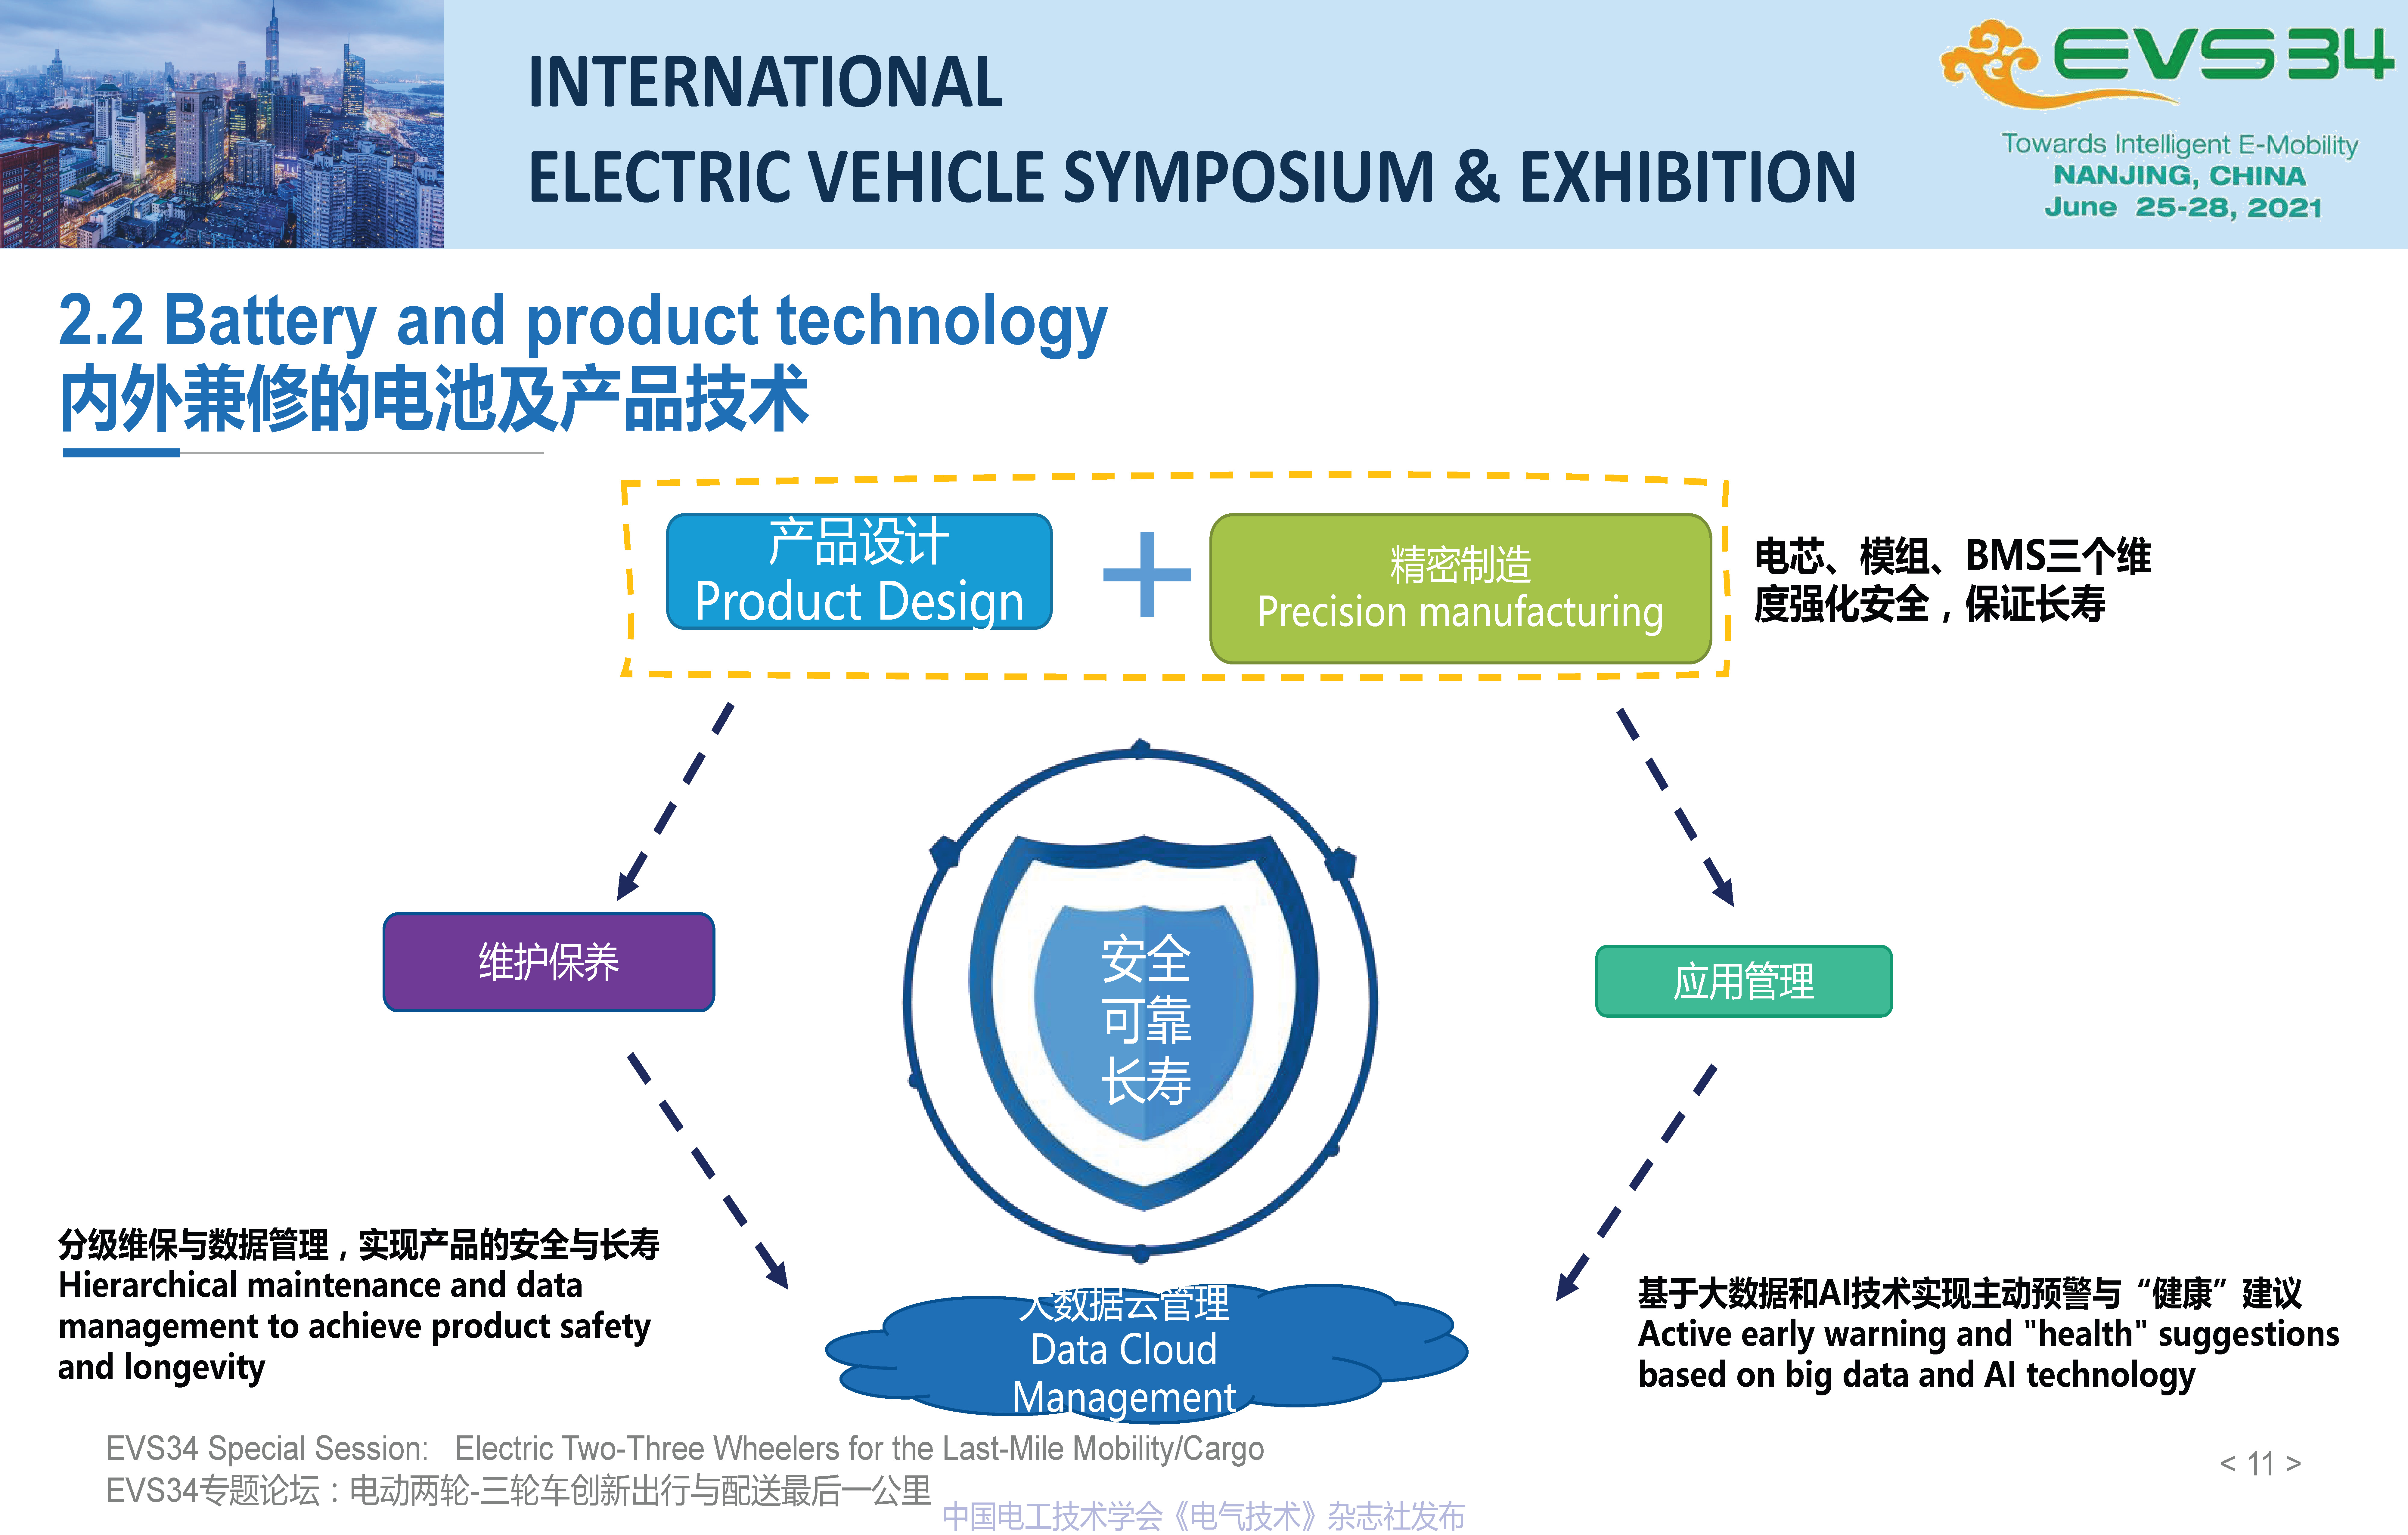 EVS34大会报告:轻型车锂电池产品、技术与服务创新